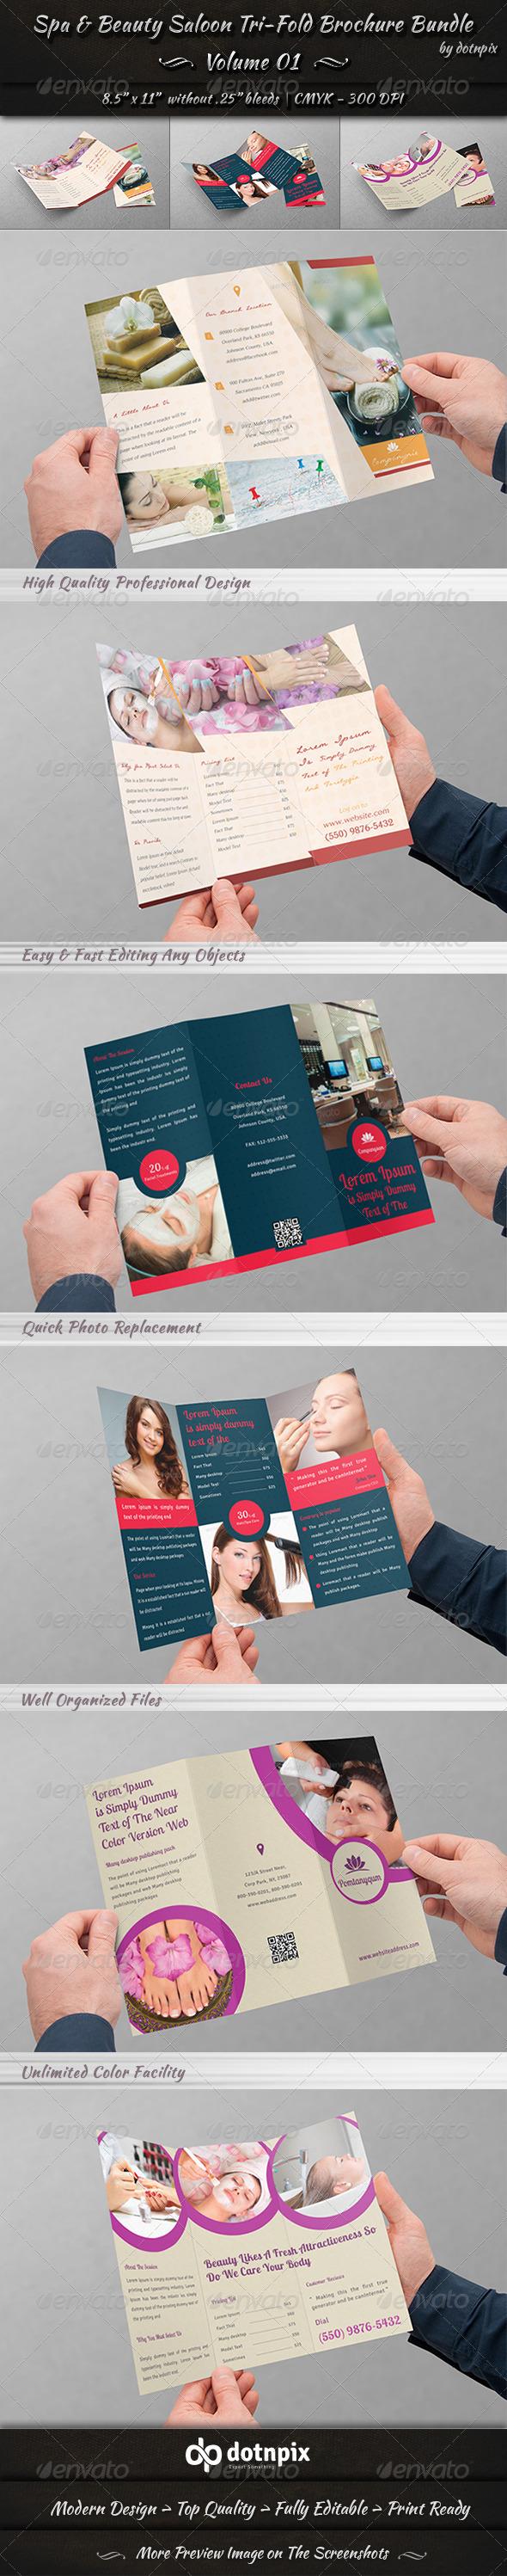 GraphicRiver Spa & Beauty Saloon Tri-fold Brochure Bundle V 1 8056135